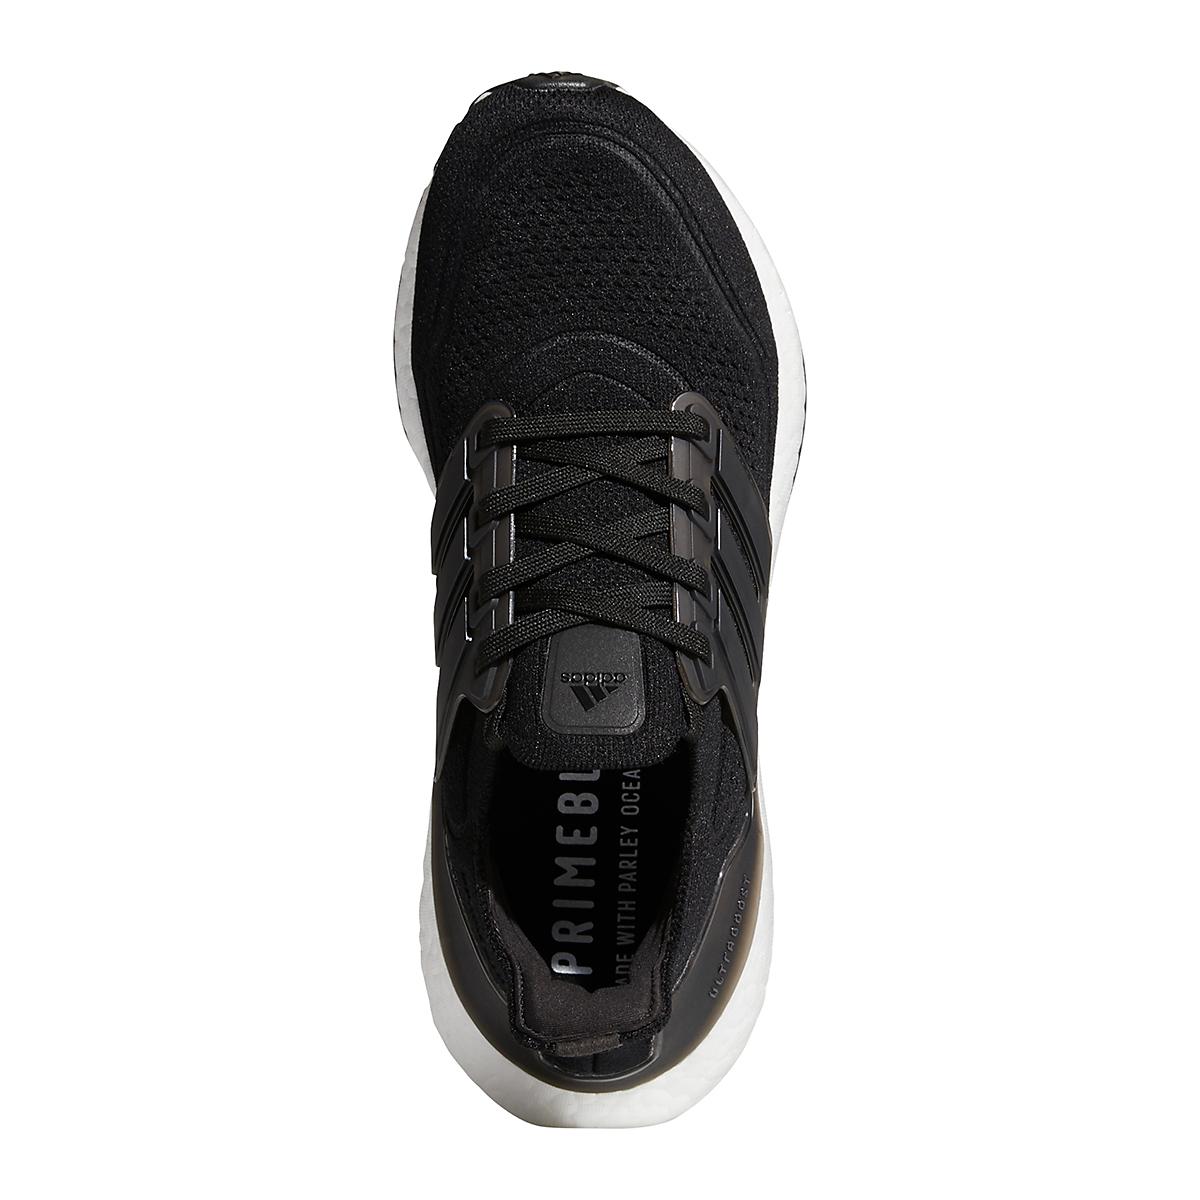 Women's Adidas Ultraboost 21 Running Shoe - Color: Core Black/Grey - Size: 5 - Width: Regular, Core Black/Grey, large, image 5